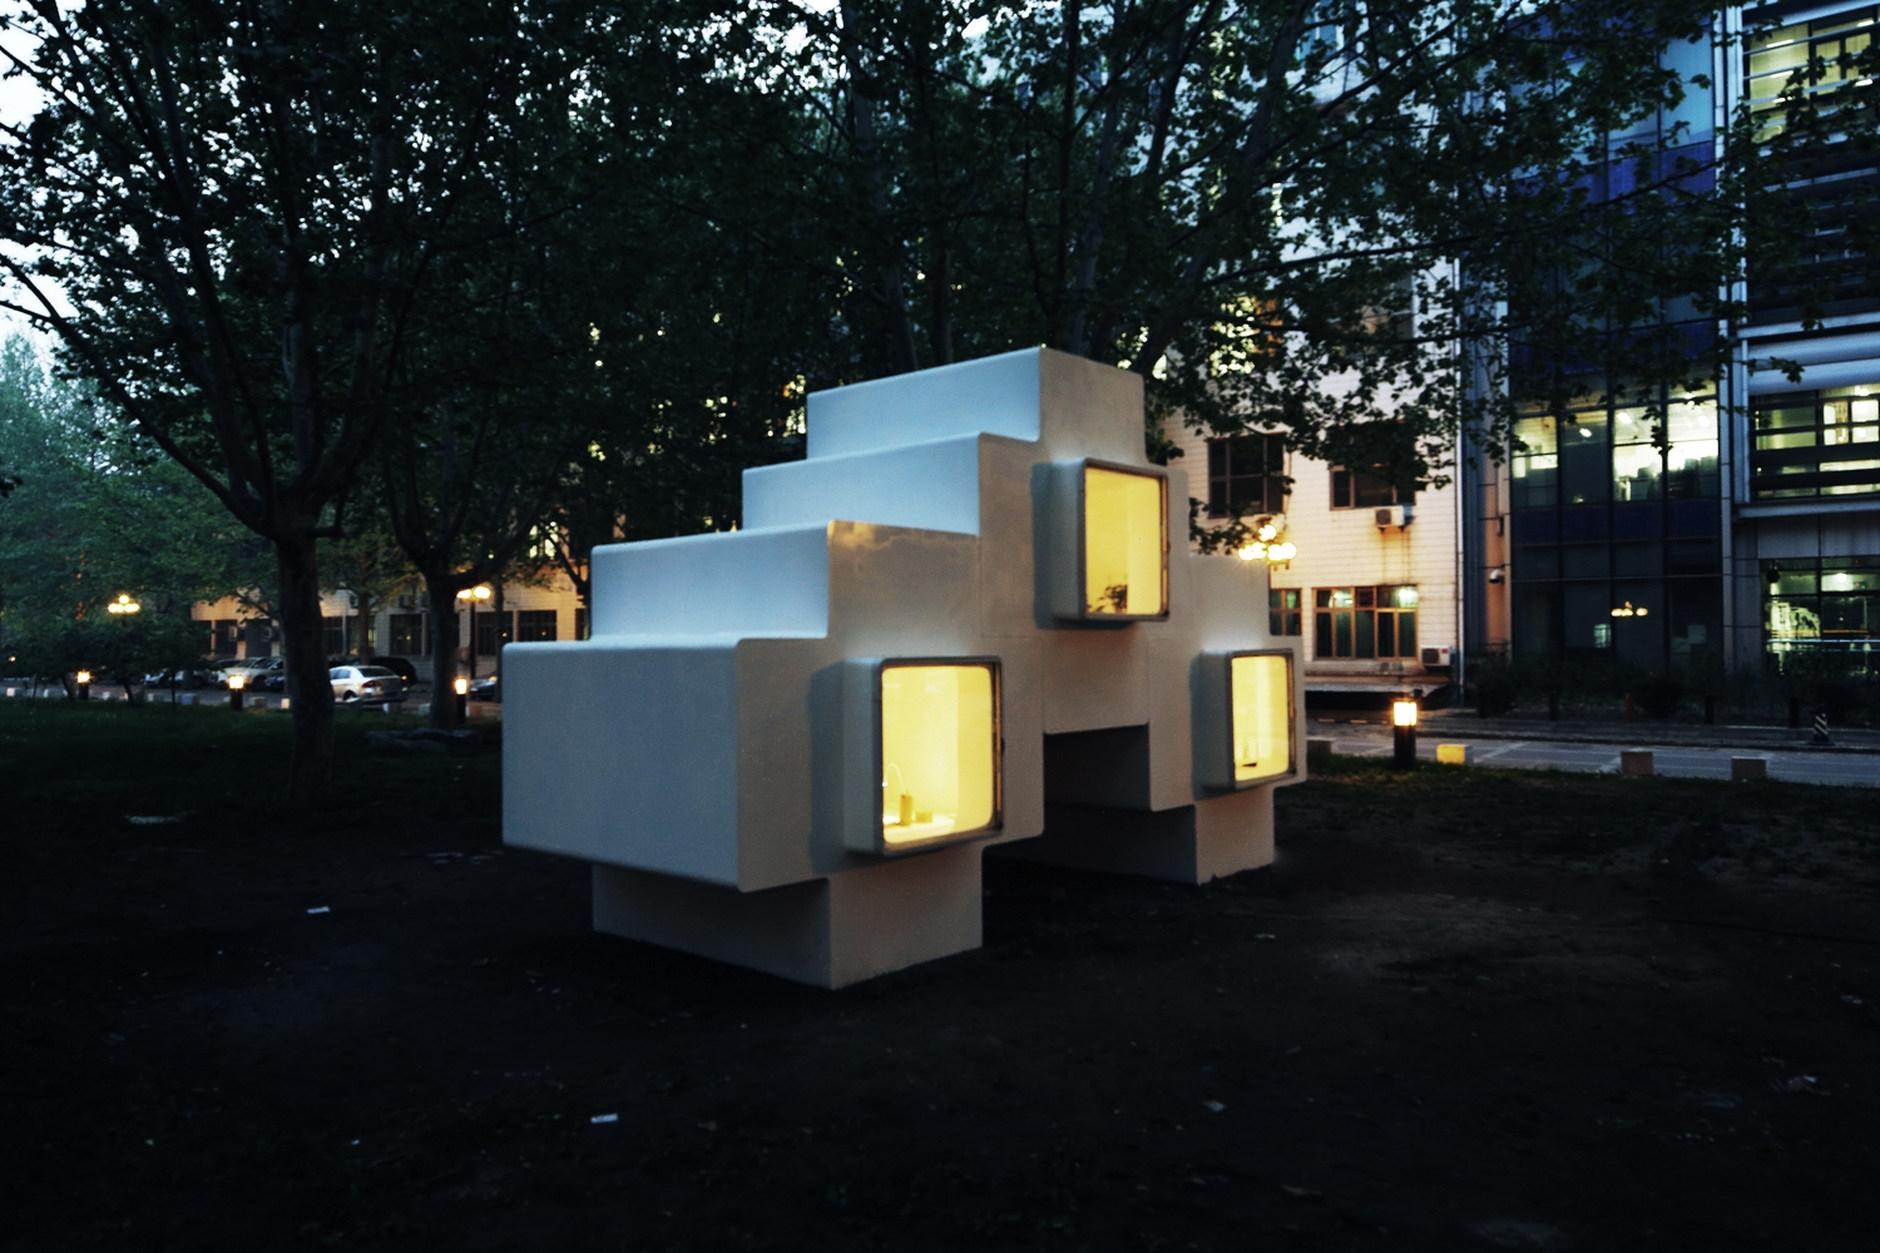 micro house by studio liu lubin karmatrendz. Black Bedroom Furniture Sets. Home Design Ideas